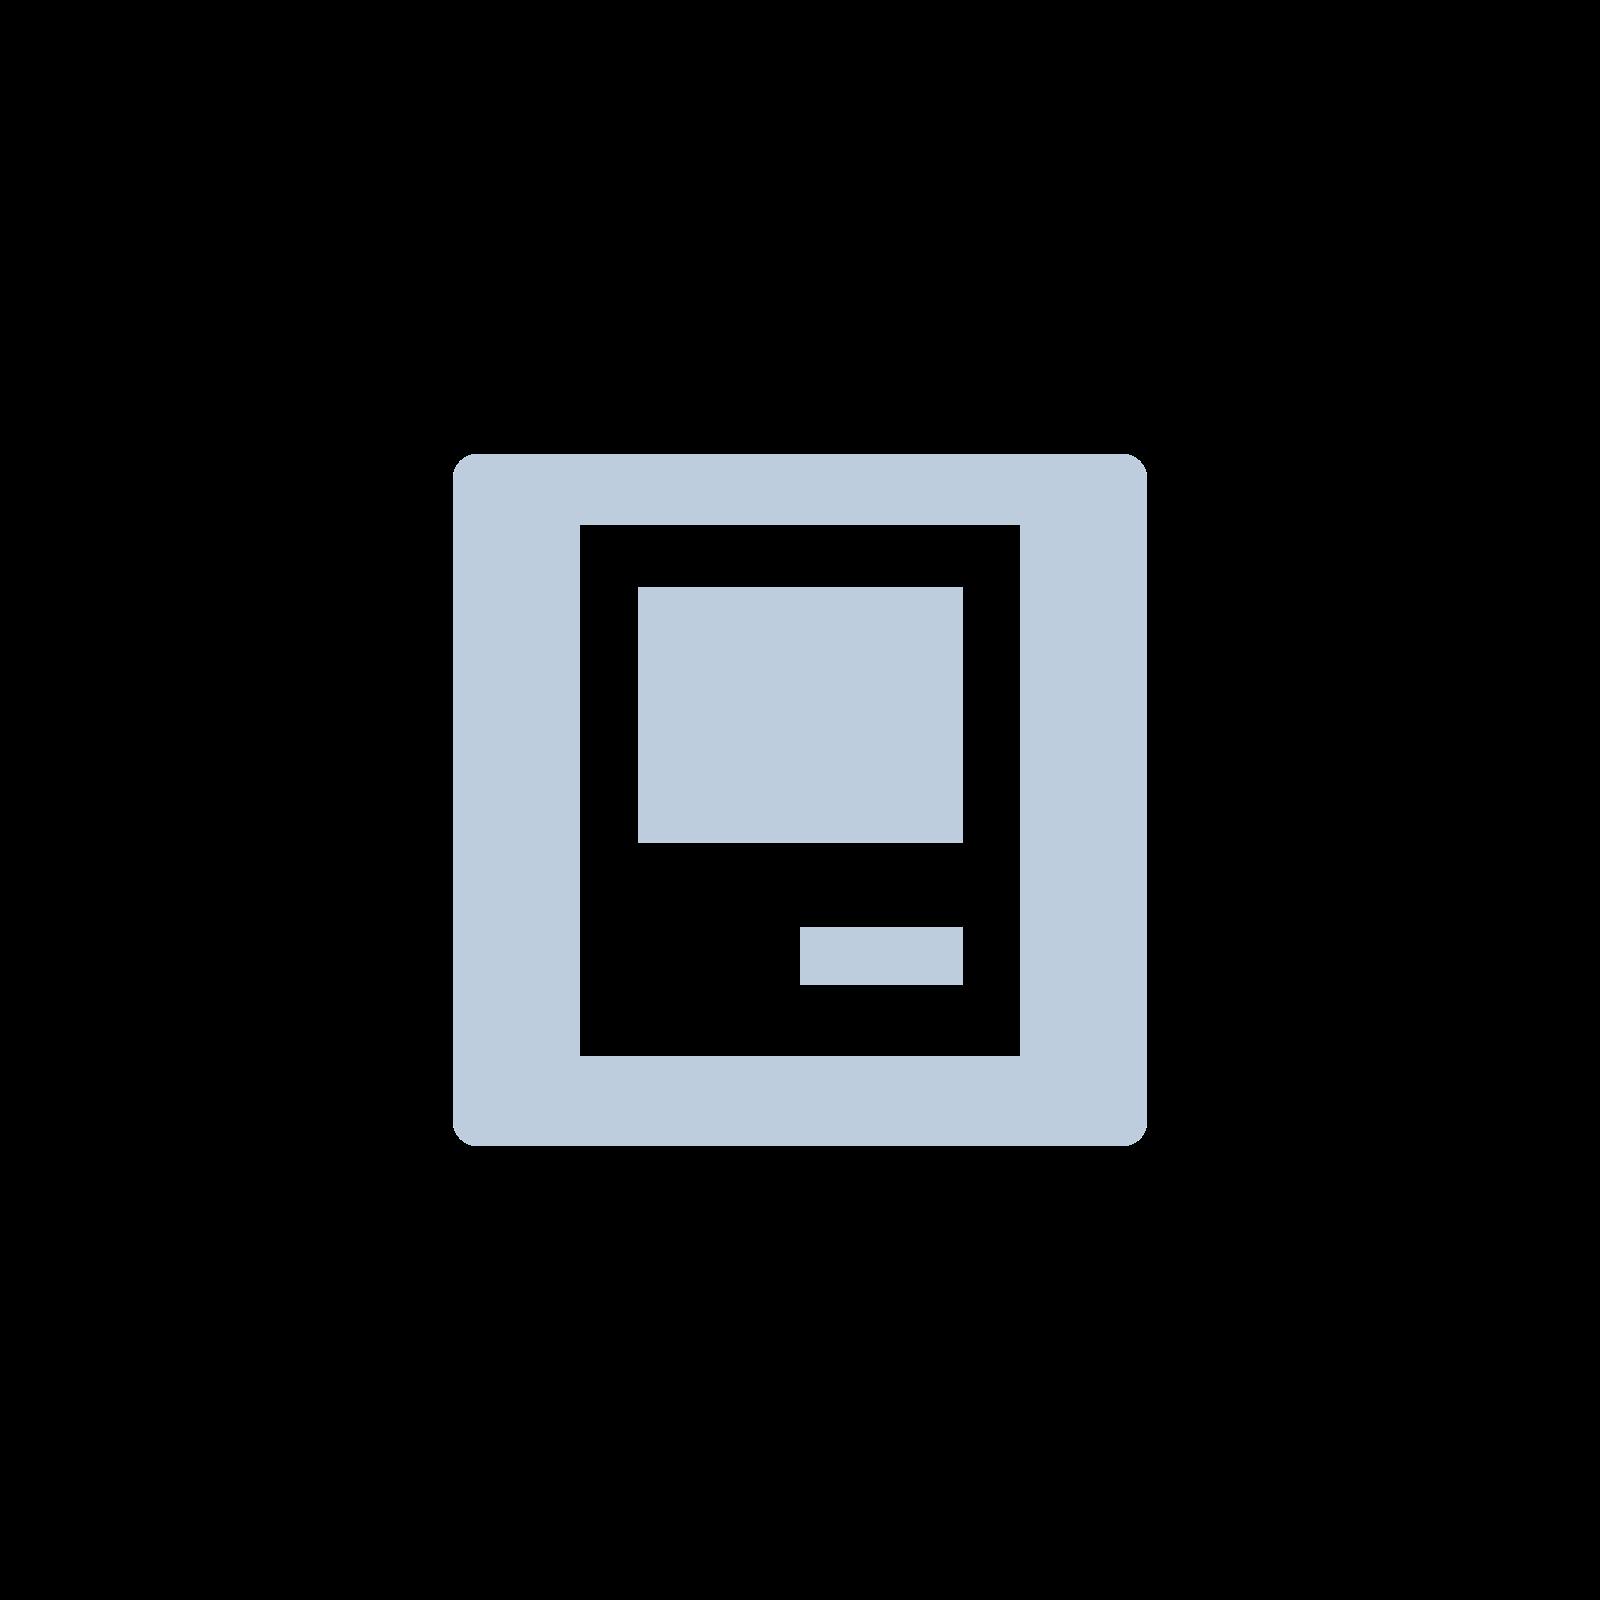 "iMac 43,18 cm (17,0"") PowerPC G4 1.0GHz (PowerMac6,1, 80GB, 768 MB)"